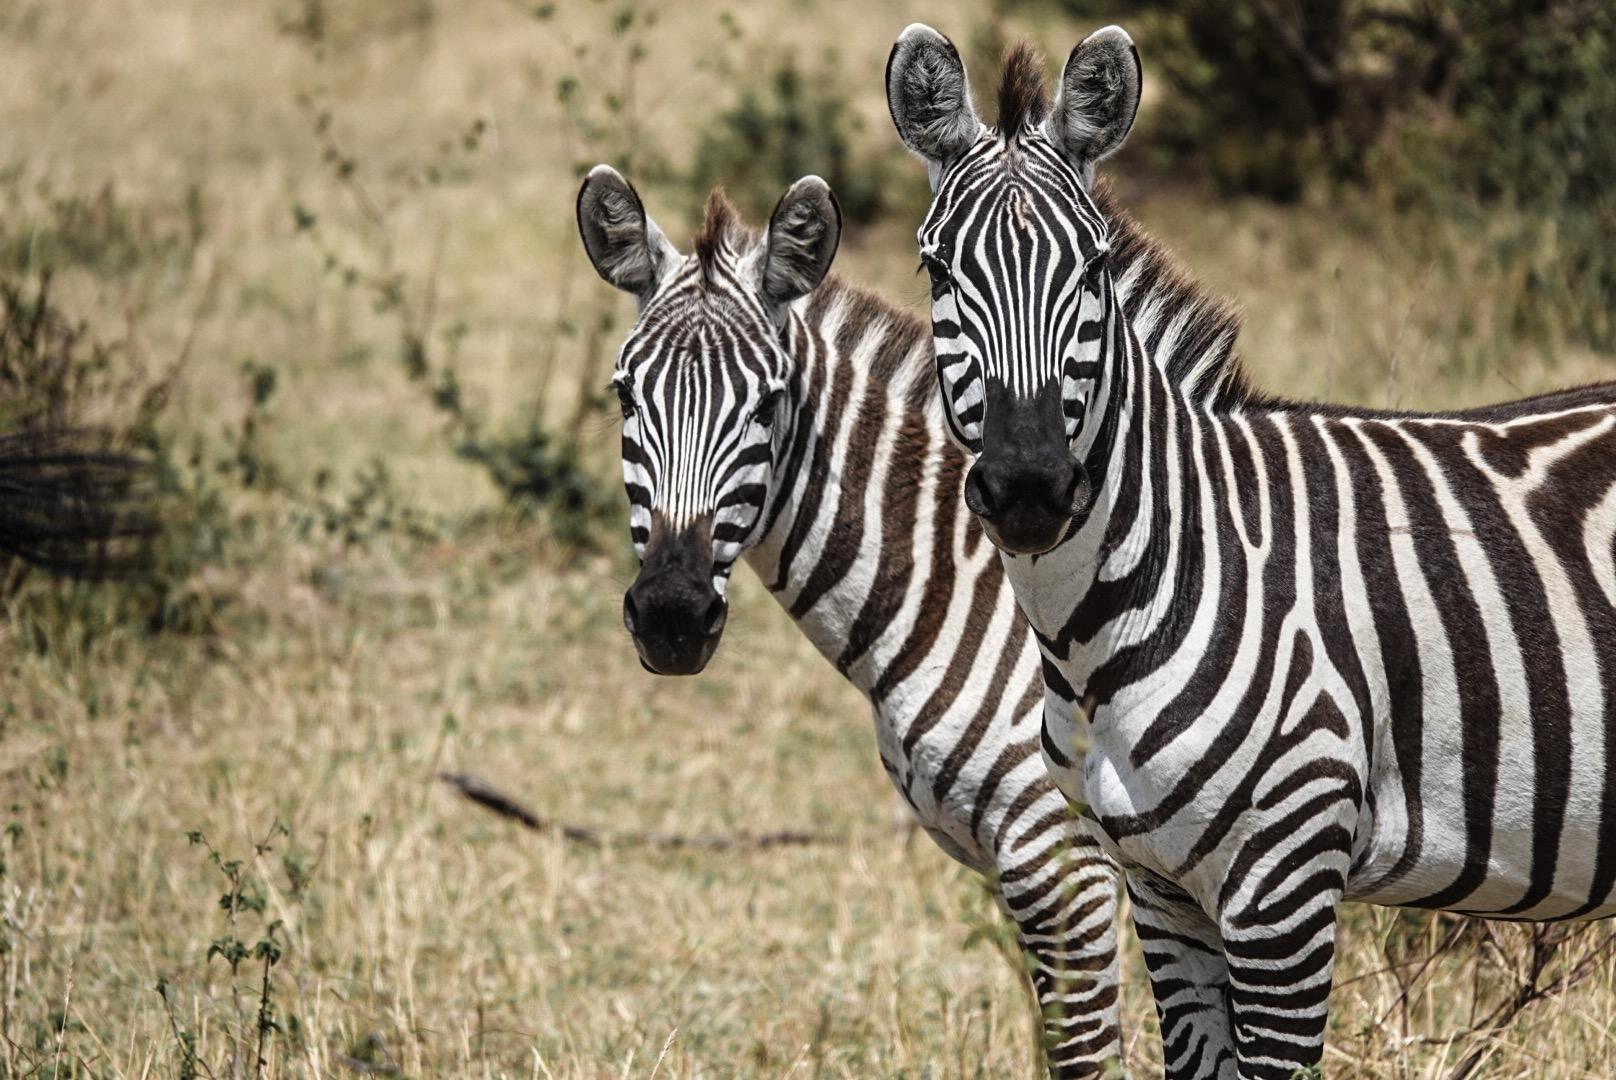 Zebras in Kenya, Africa | Safari Photos Ph. Ashley Torres